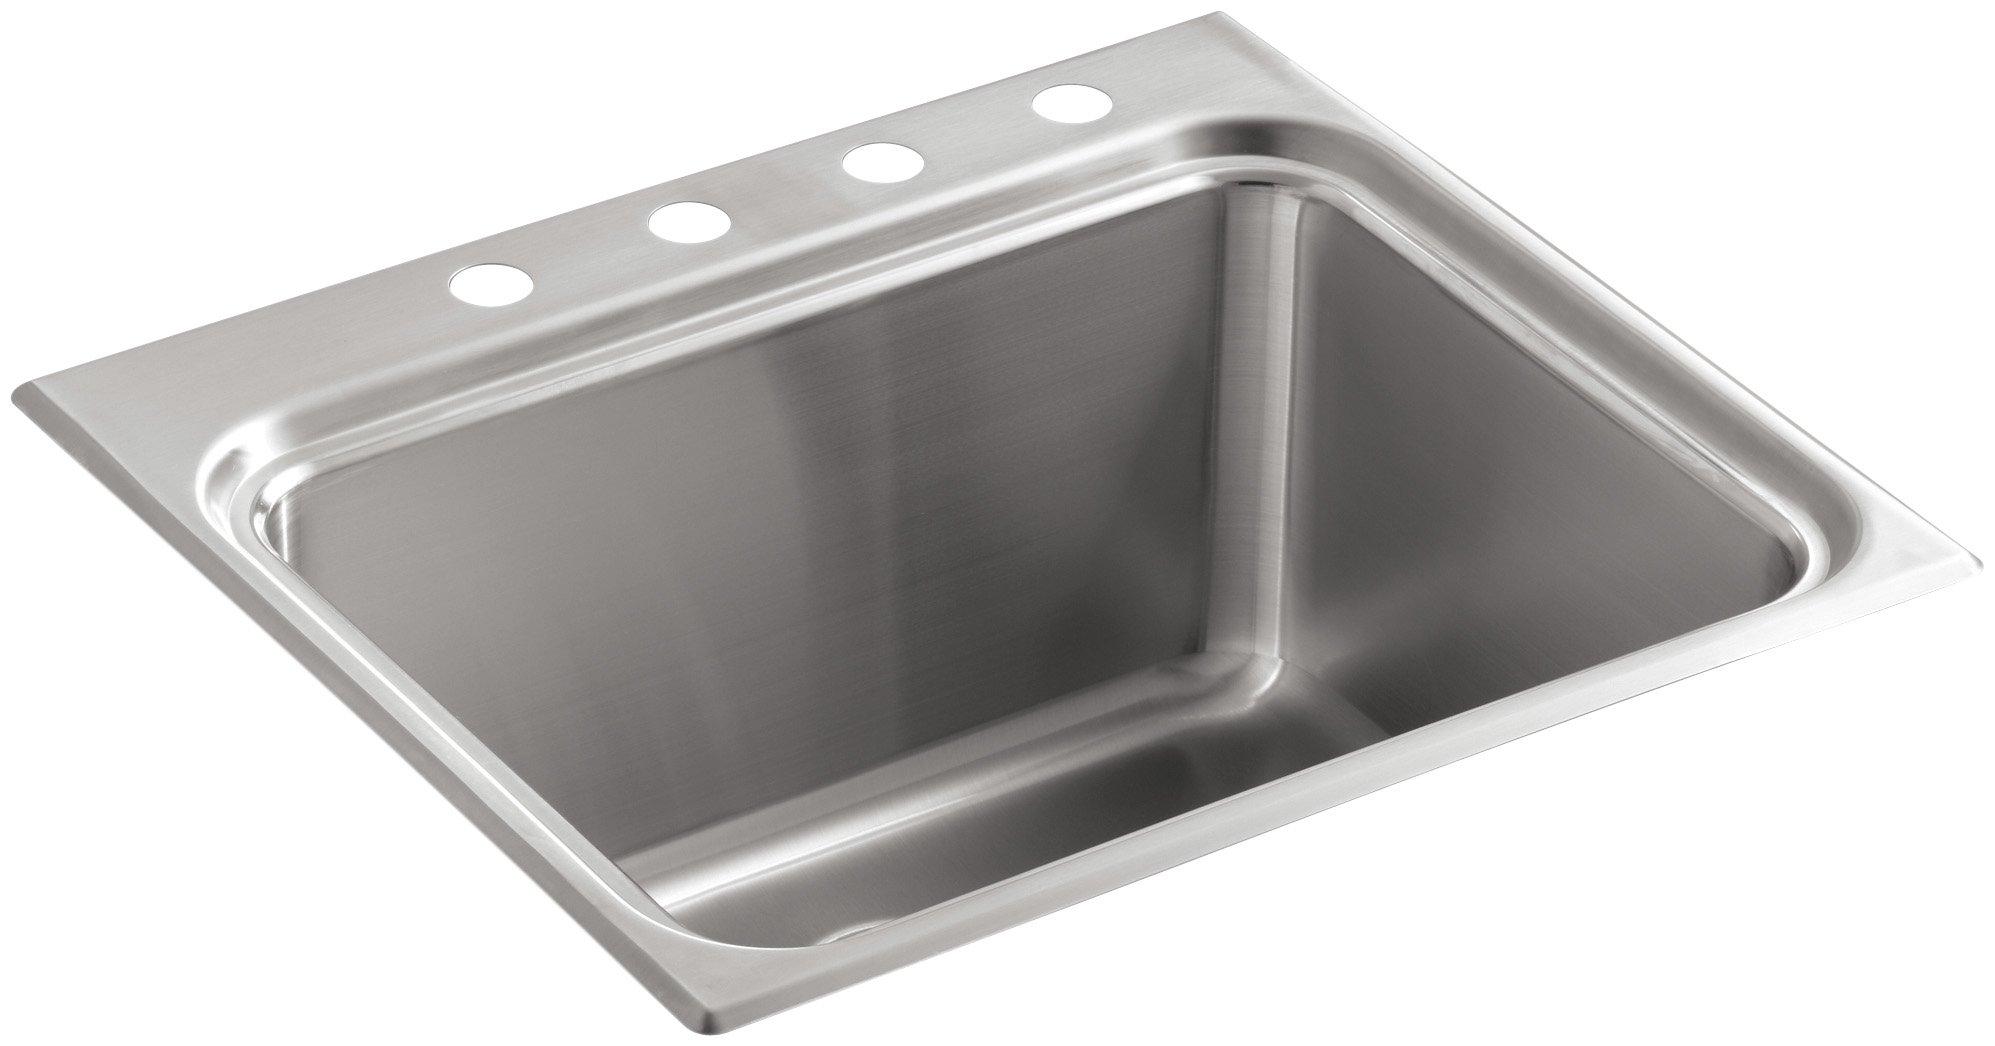 KOHLER K-3208-4-NA Ballad Self-Rimming Utility Sink